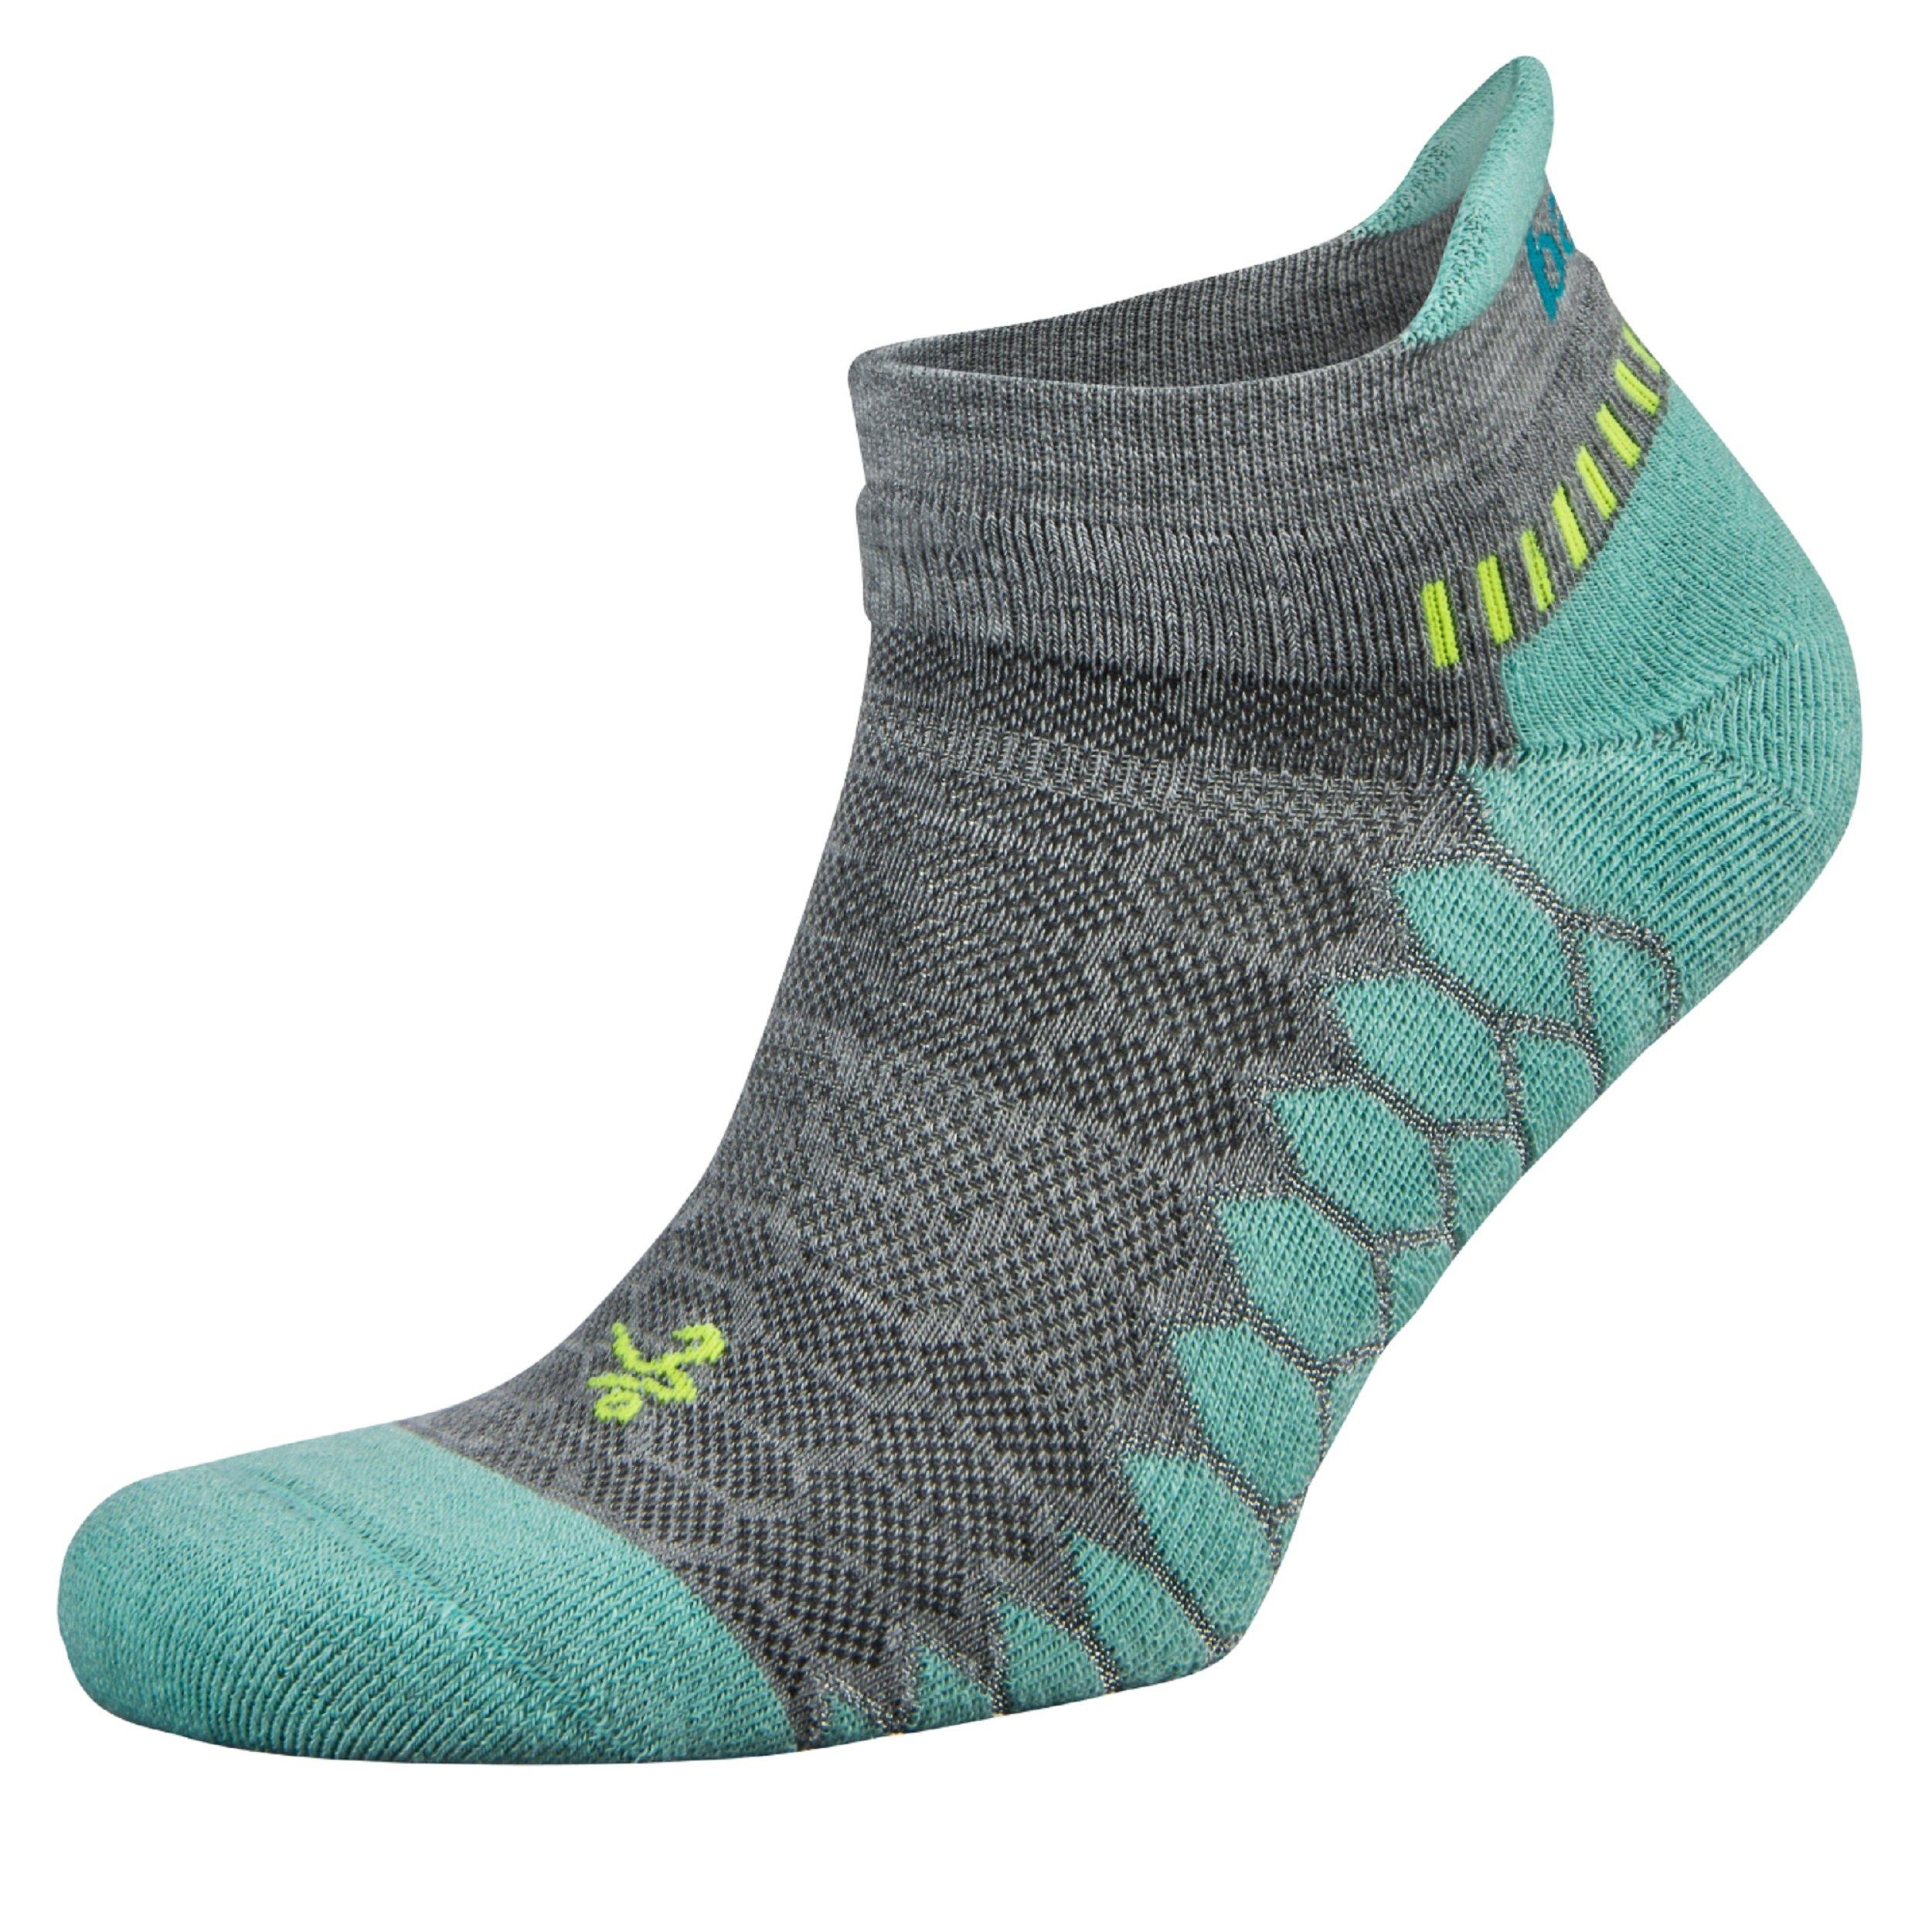 Balega Silver Antimicrobial No-Show Compression-Fit Running Socks for Men and Women (1-Pair), Midgrey/Aqua, Small by Balega